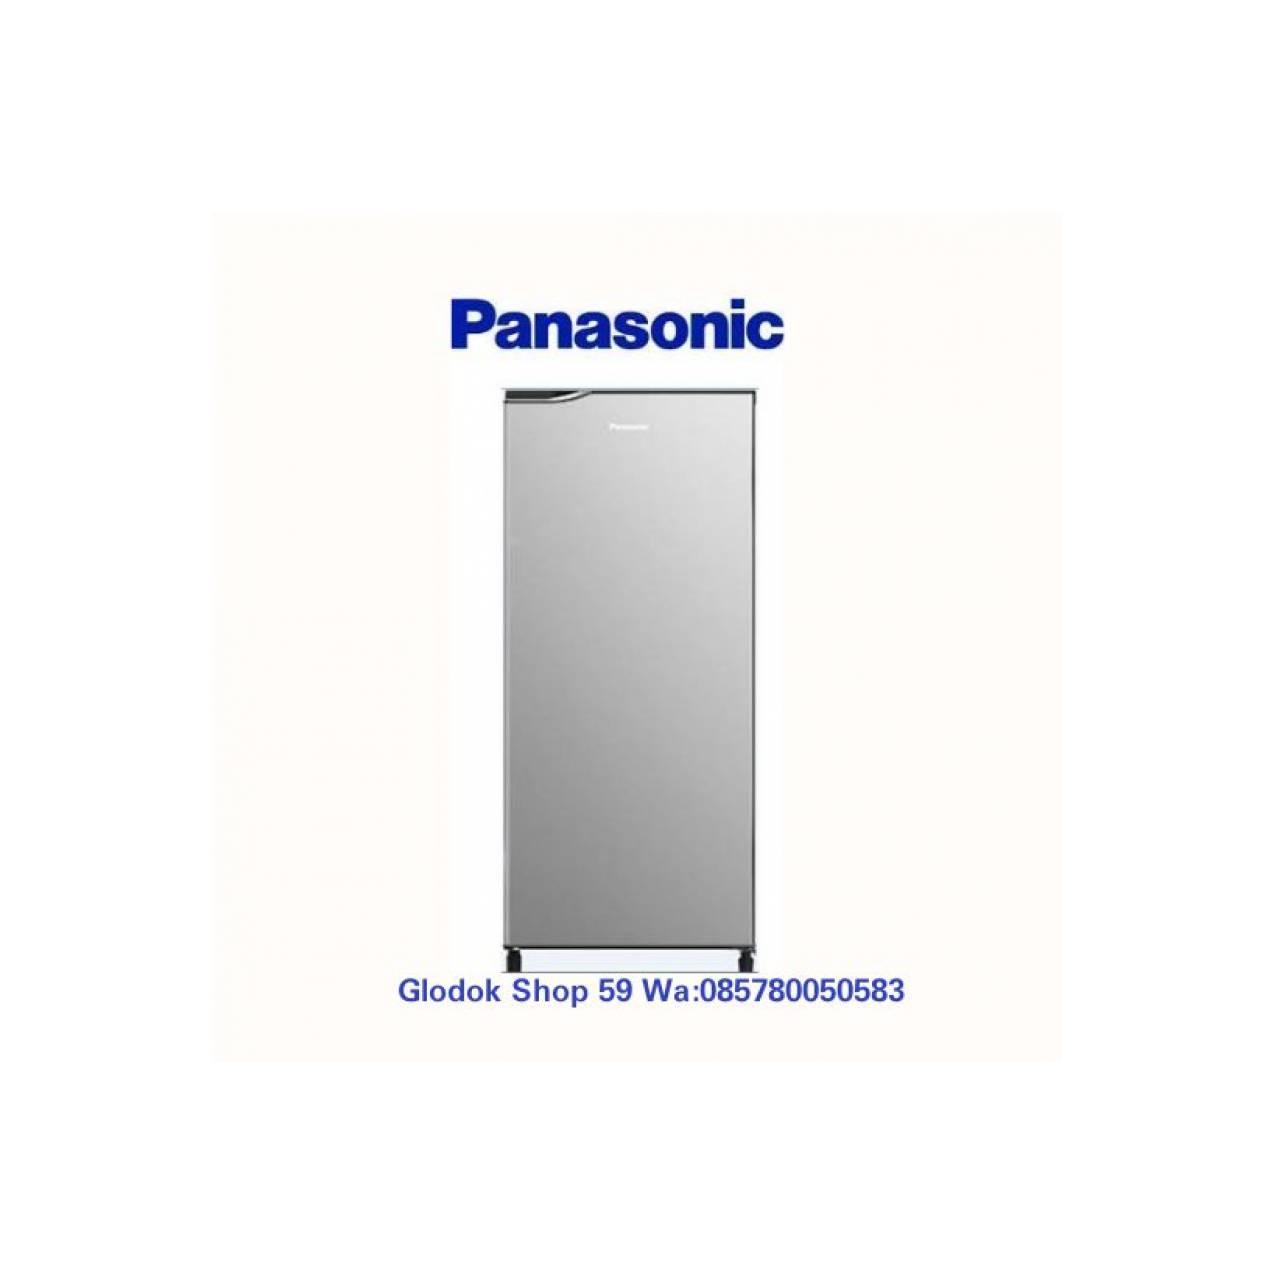 KULKAS PANASONIC NR-AF199 N/SS ALOWA GLASS TRAY 1 PINTU SILVER NEW